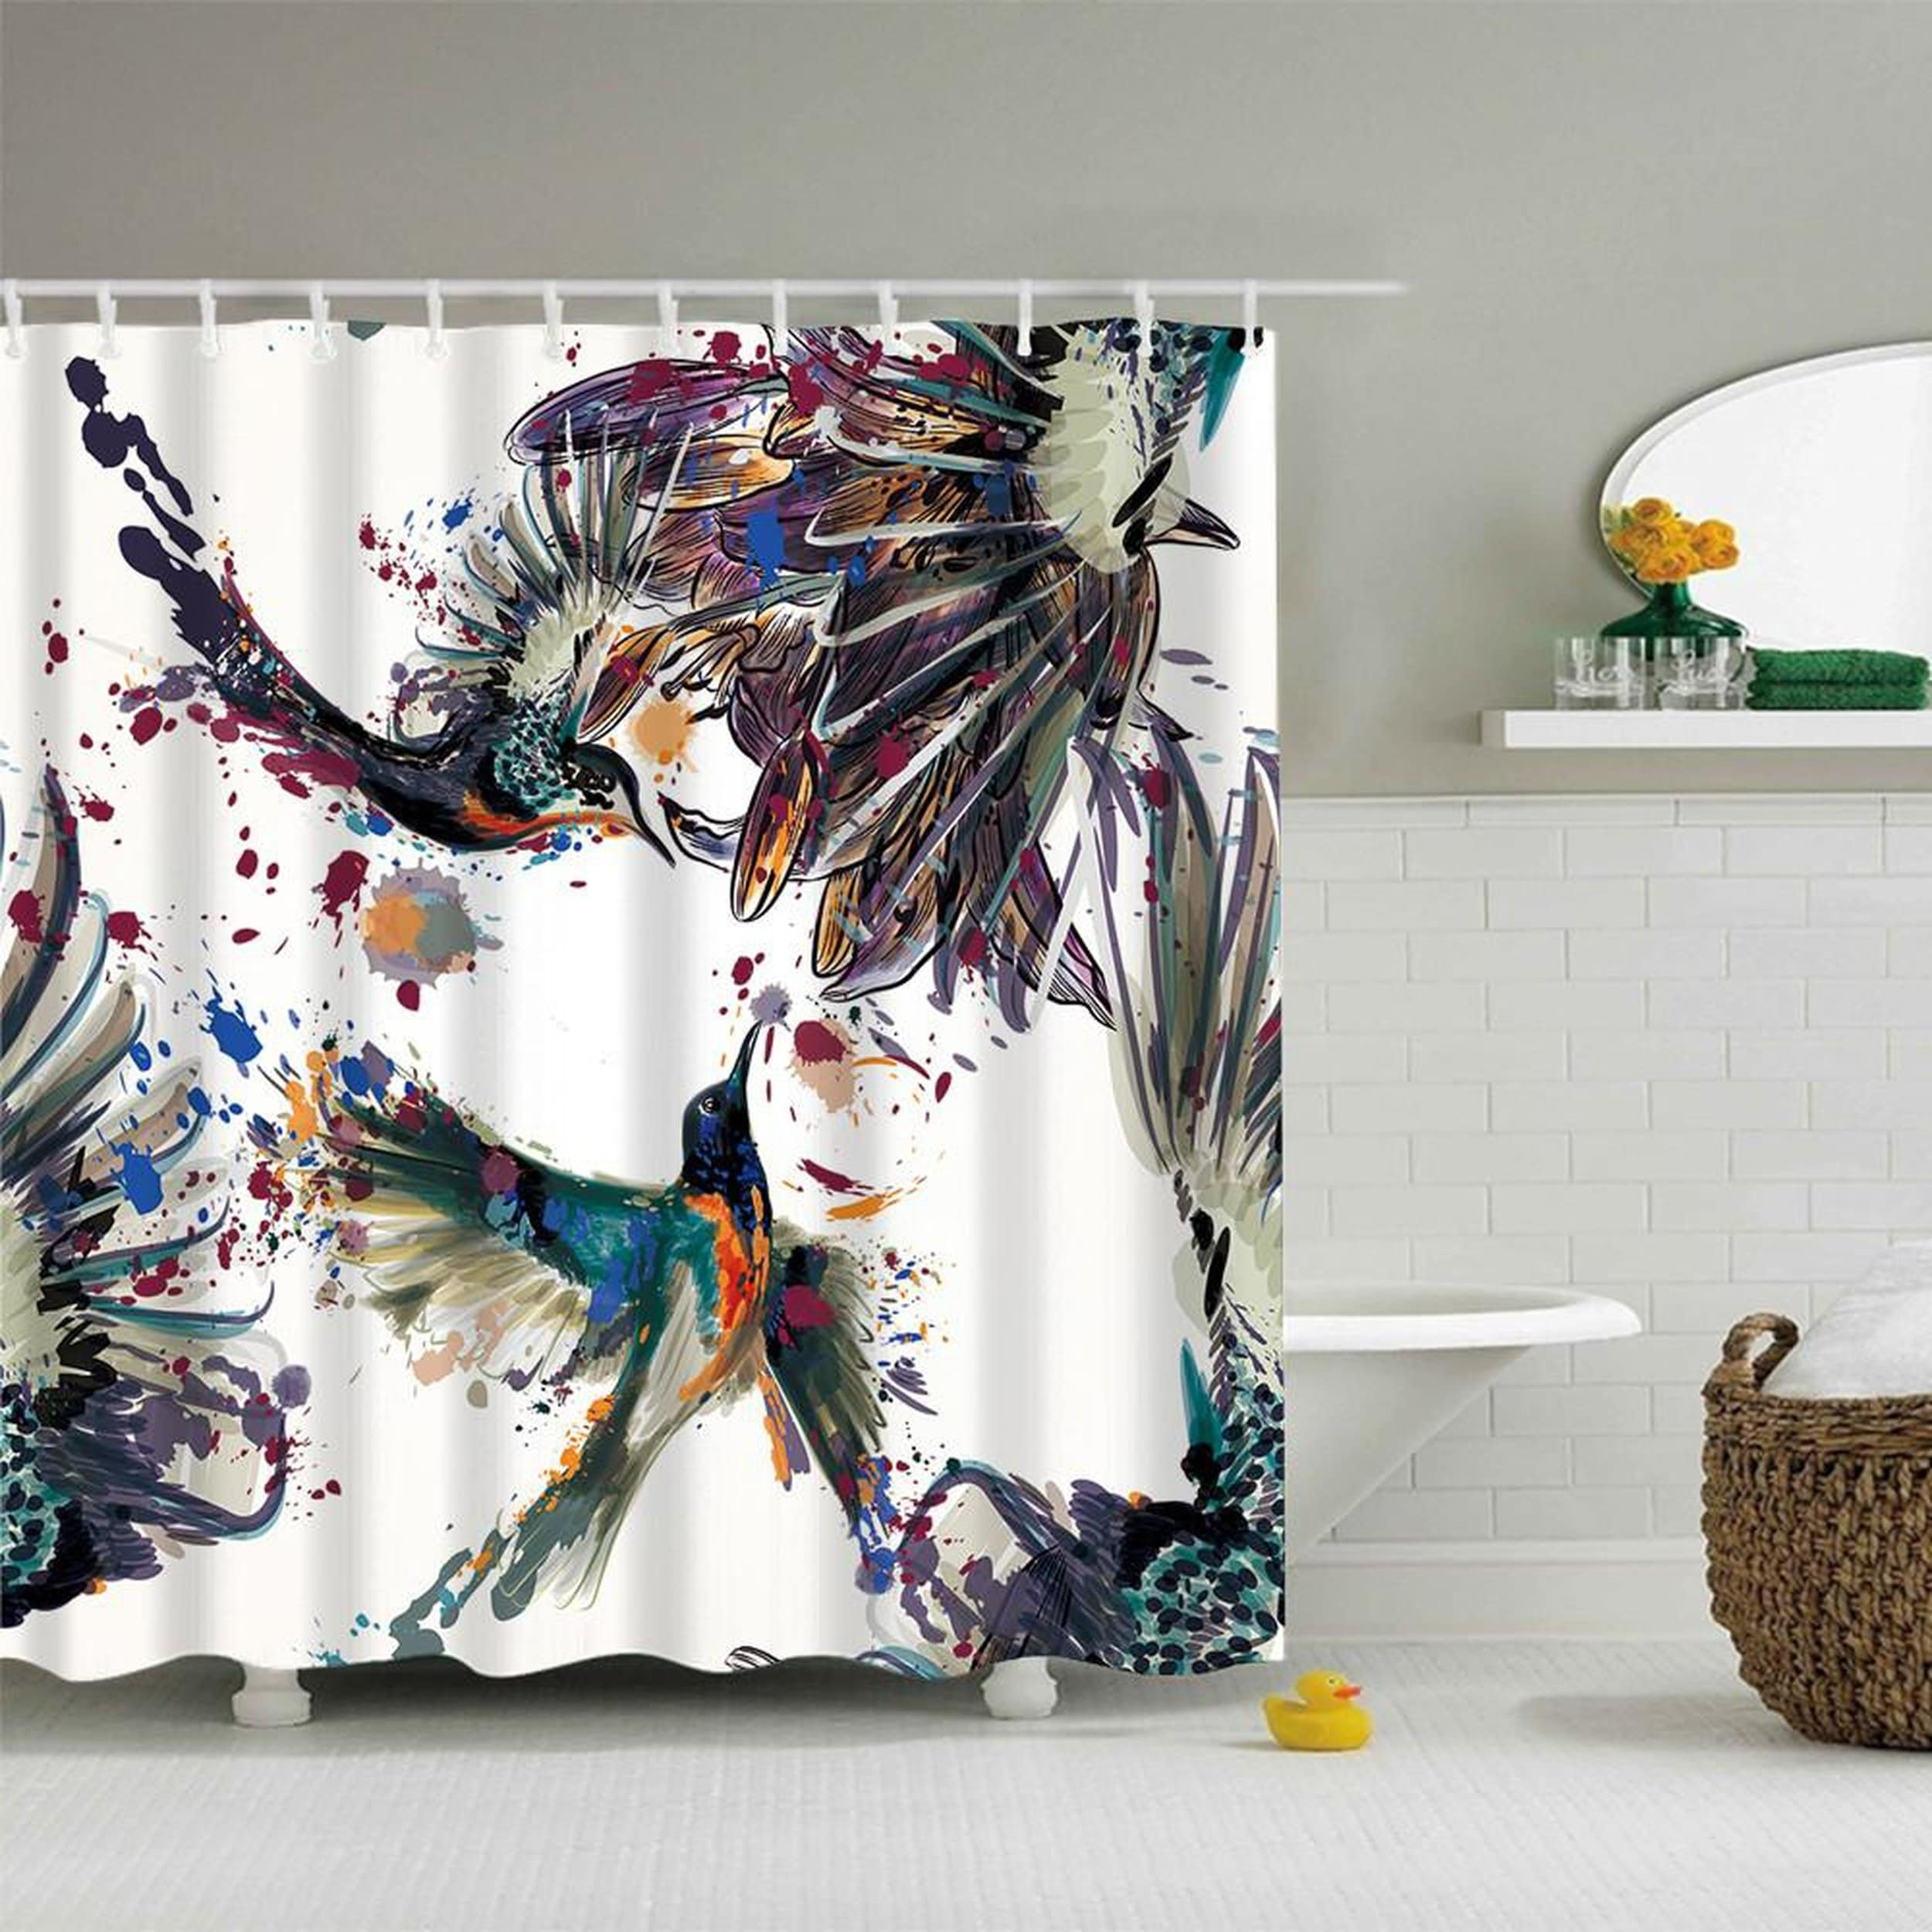 Waterproof Bird Pattern Bathroom Shower Curtain With 12 Hooks